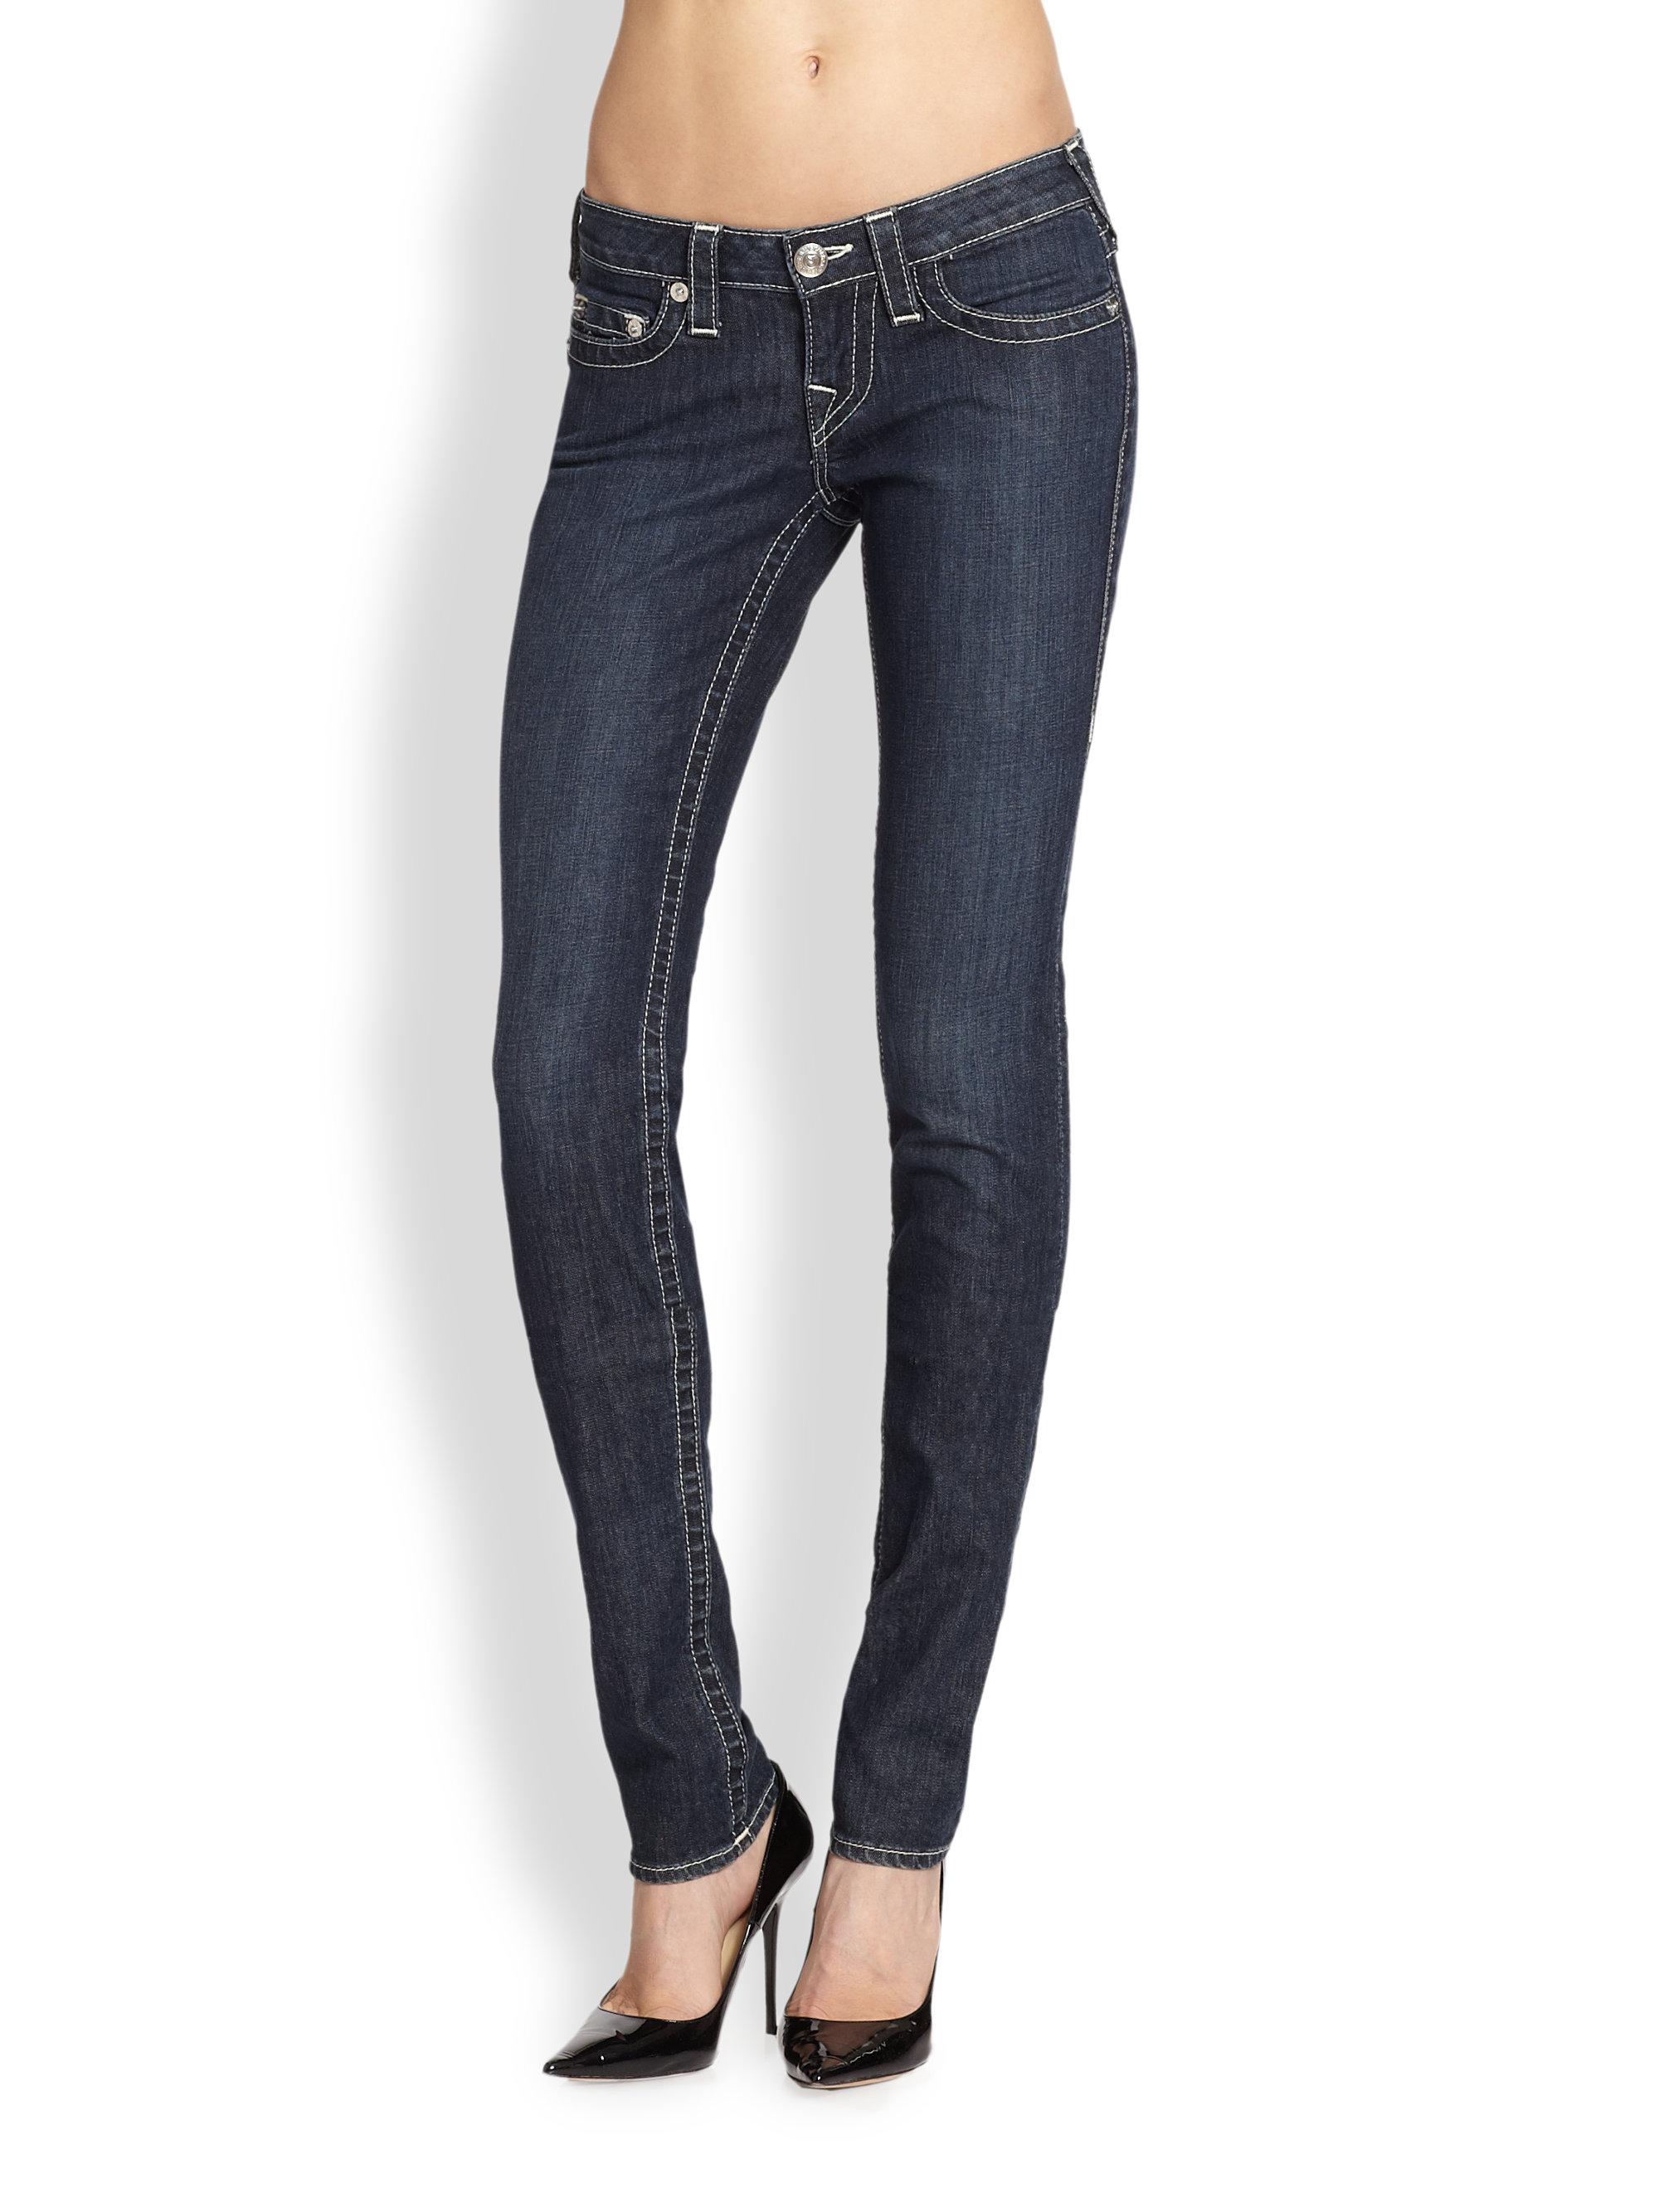 67a03193f True Religion Stella Skinny Jeans in Blue - Lyst